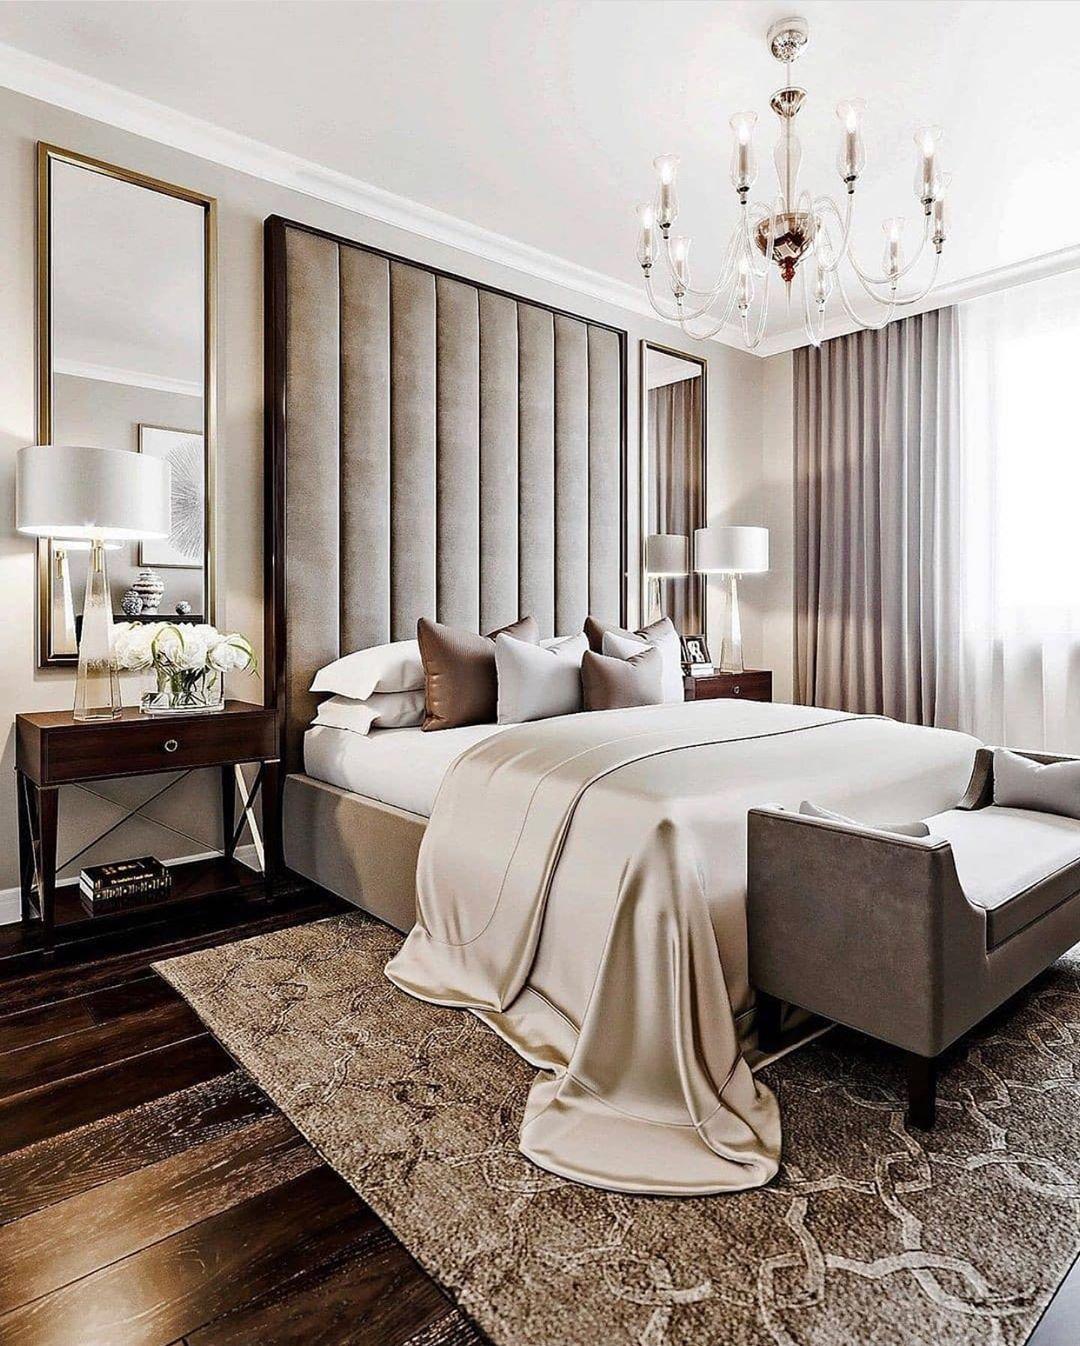 Interior Design Home Decor On Instagram Design Balcon Studio Follow Olla Home For More In 2020 Luxury Bedroom Master Hotel Bedroom Design Hotel Style Bedroom